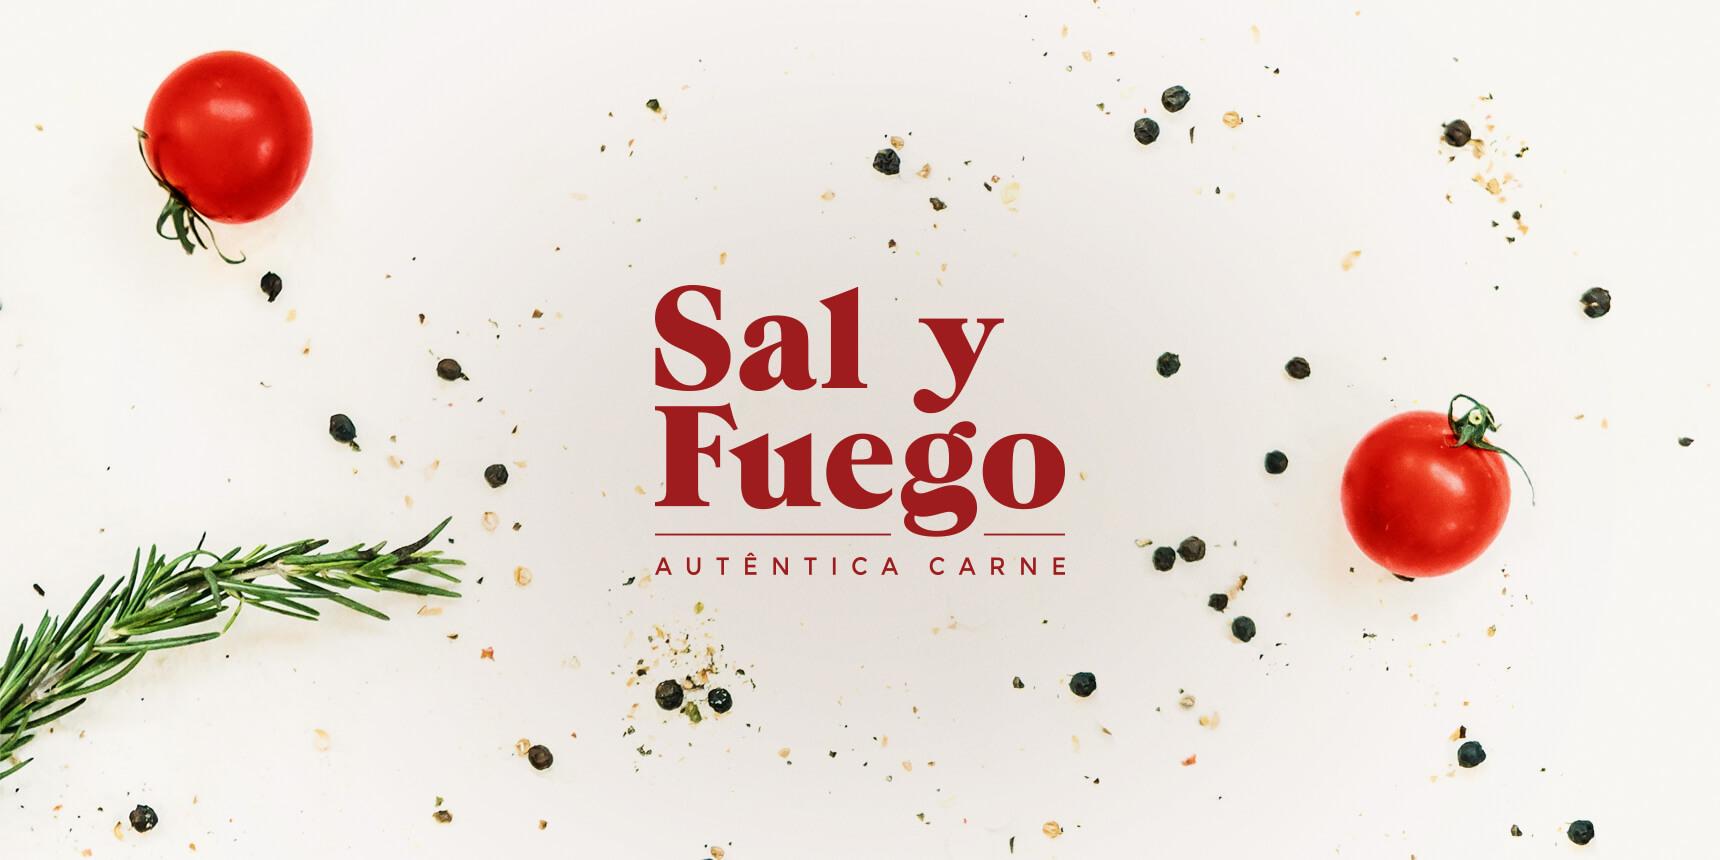 firmorama_salyfuego_02